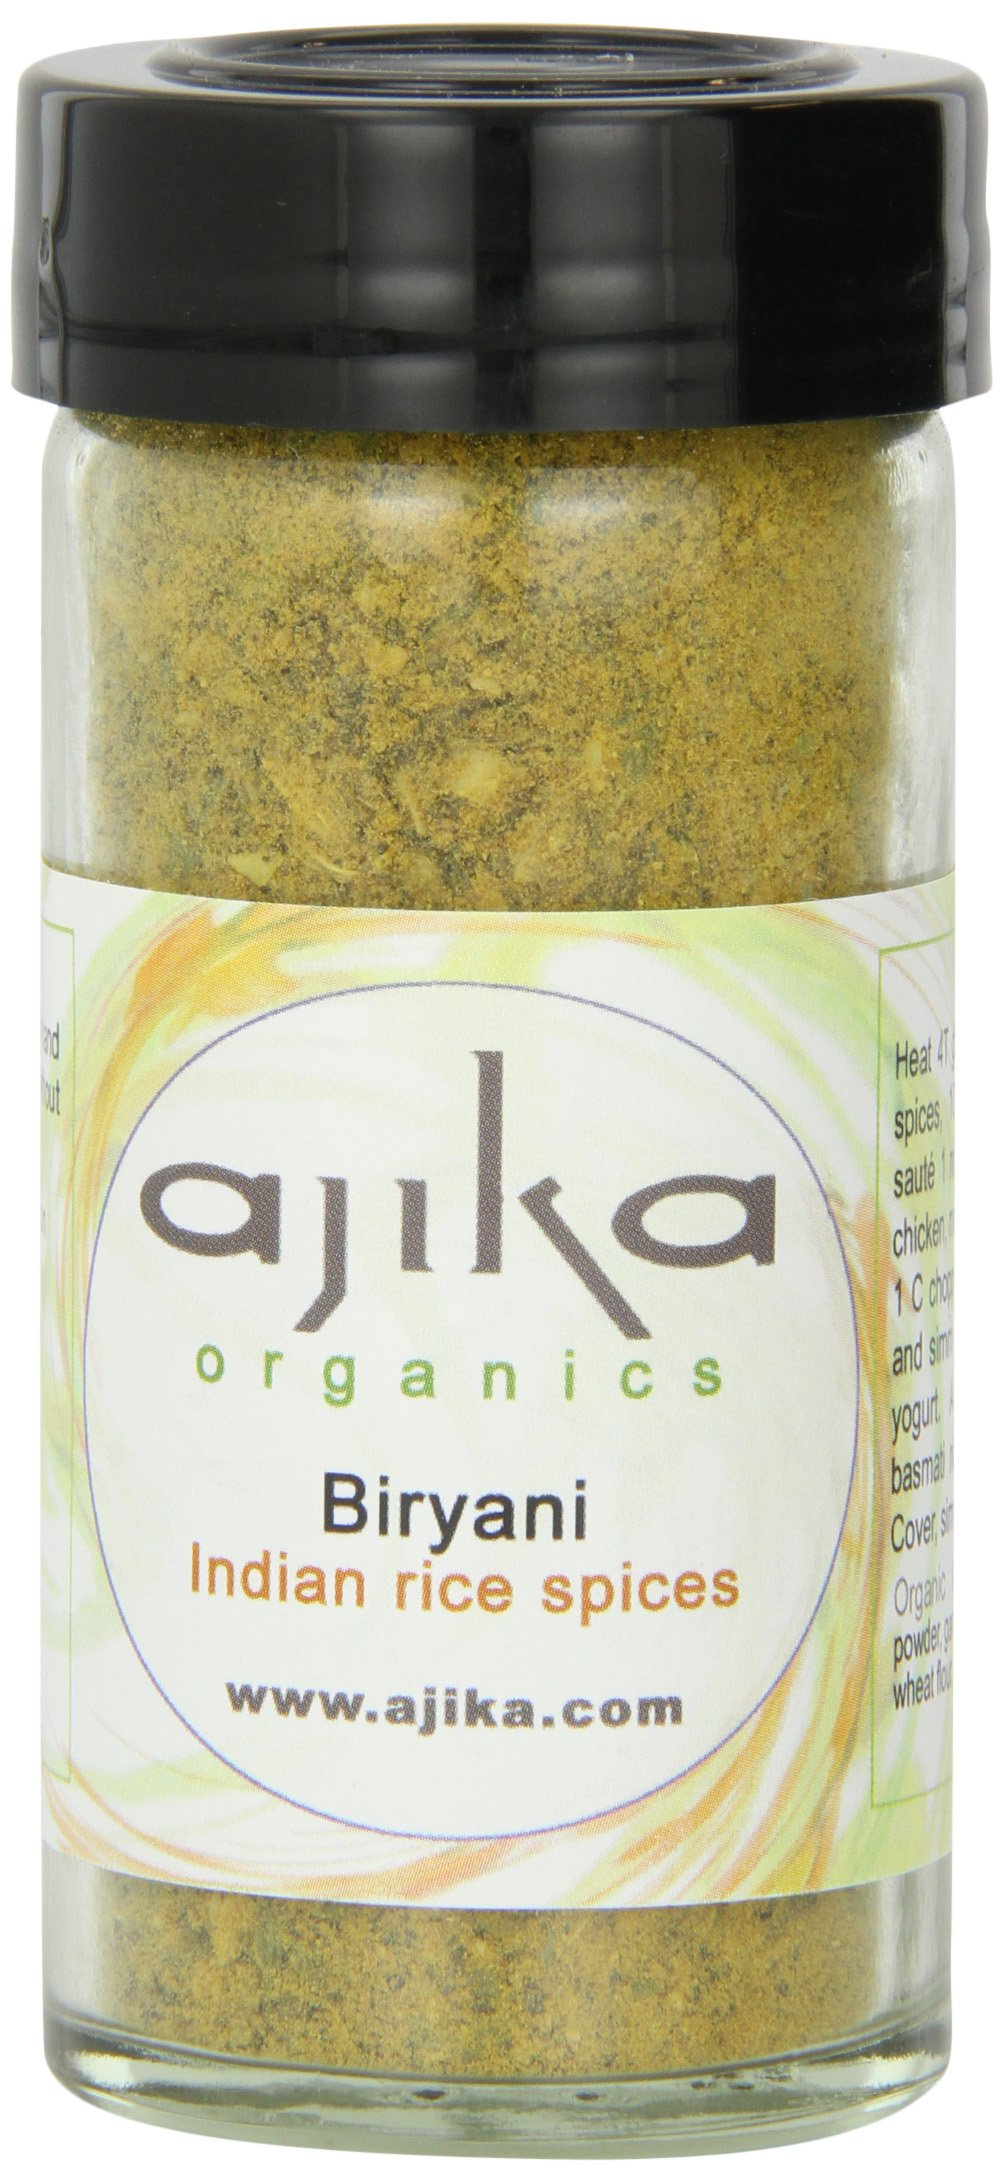 Ajika Organic Biryani, Seasoning for Rice, Poultry & Meat, 2.6-Ounce